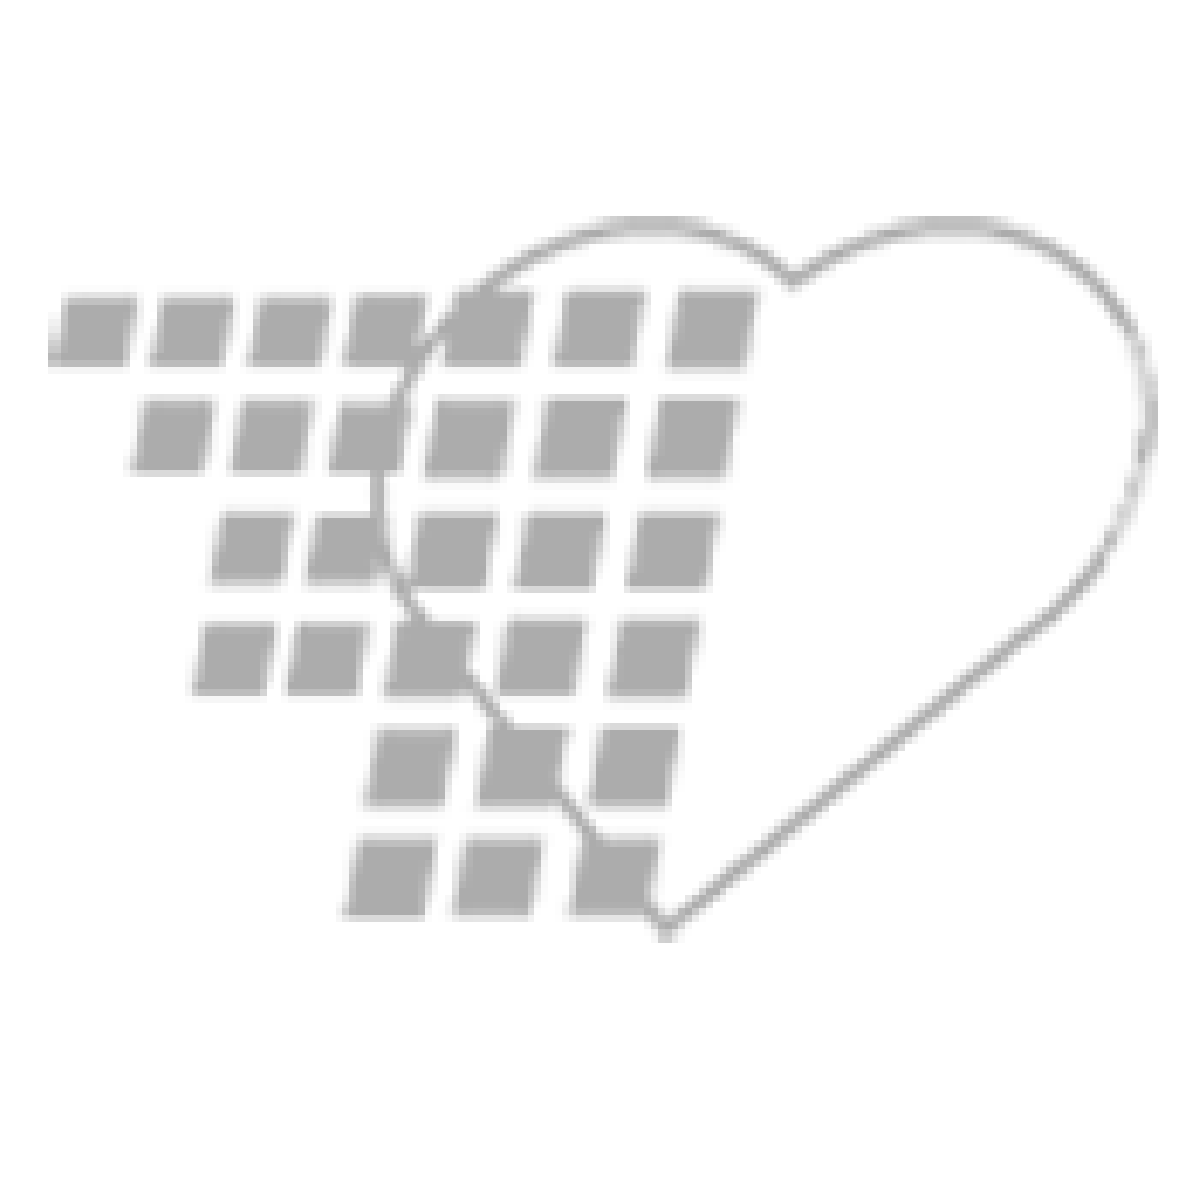 07-71-1231 Nasal Airway Latex Free Robertazzi Style